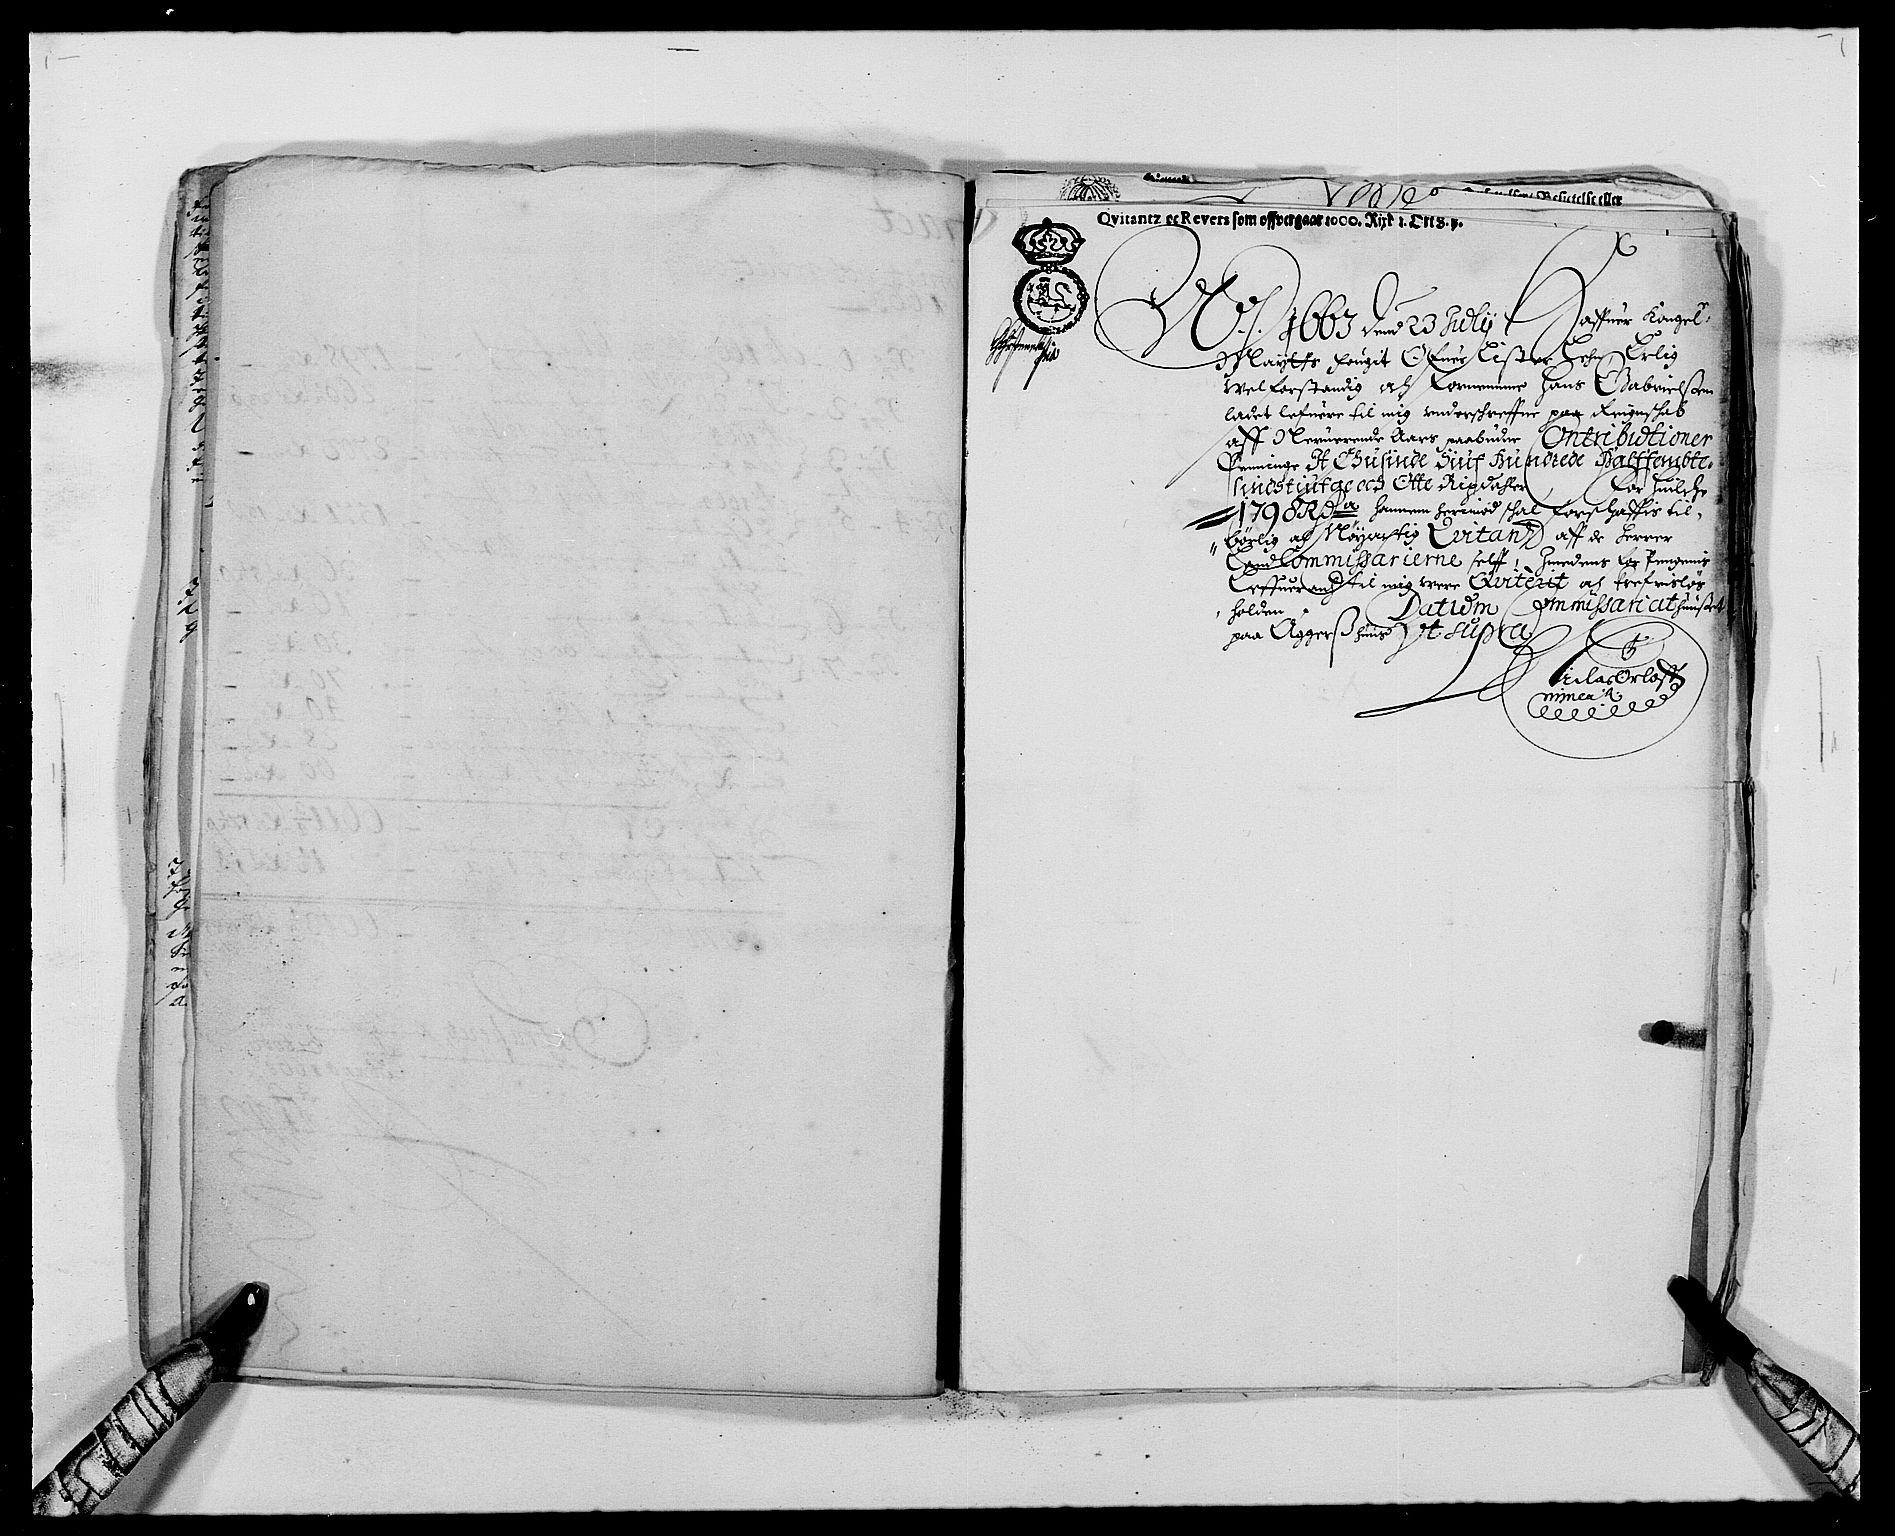 RA, Rentekammeret inntil 1814, Reviderte regnskaper, Fogderegnskap, R41/L2523: Fogderegnskap Lista, 1663-1664, s. 192